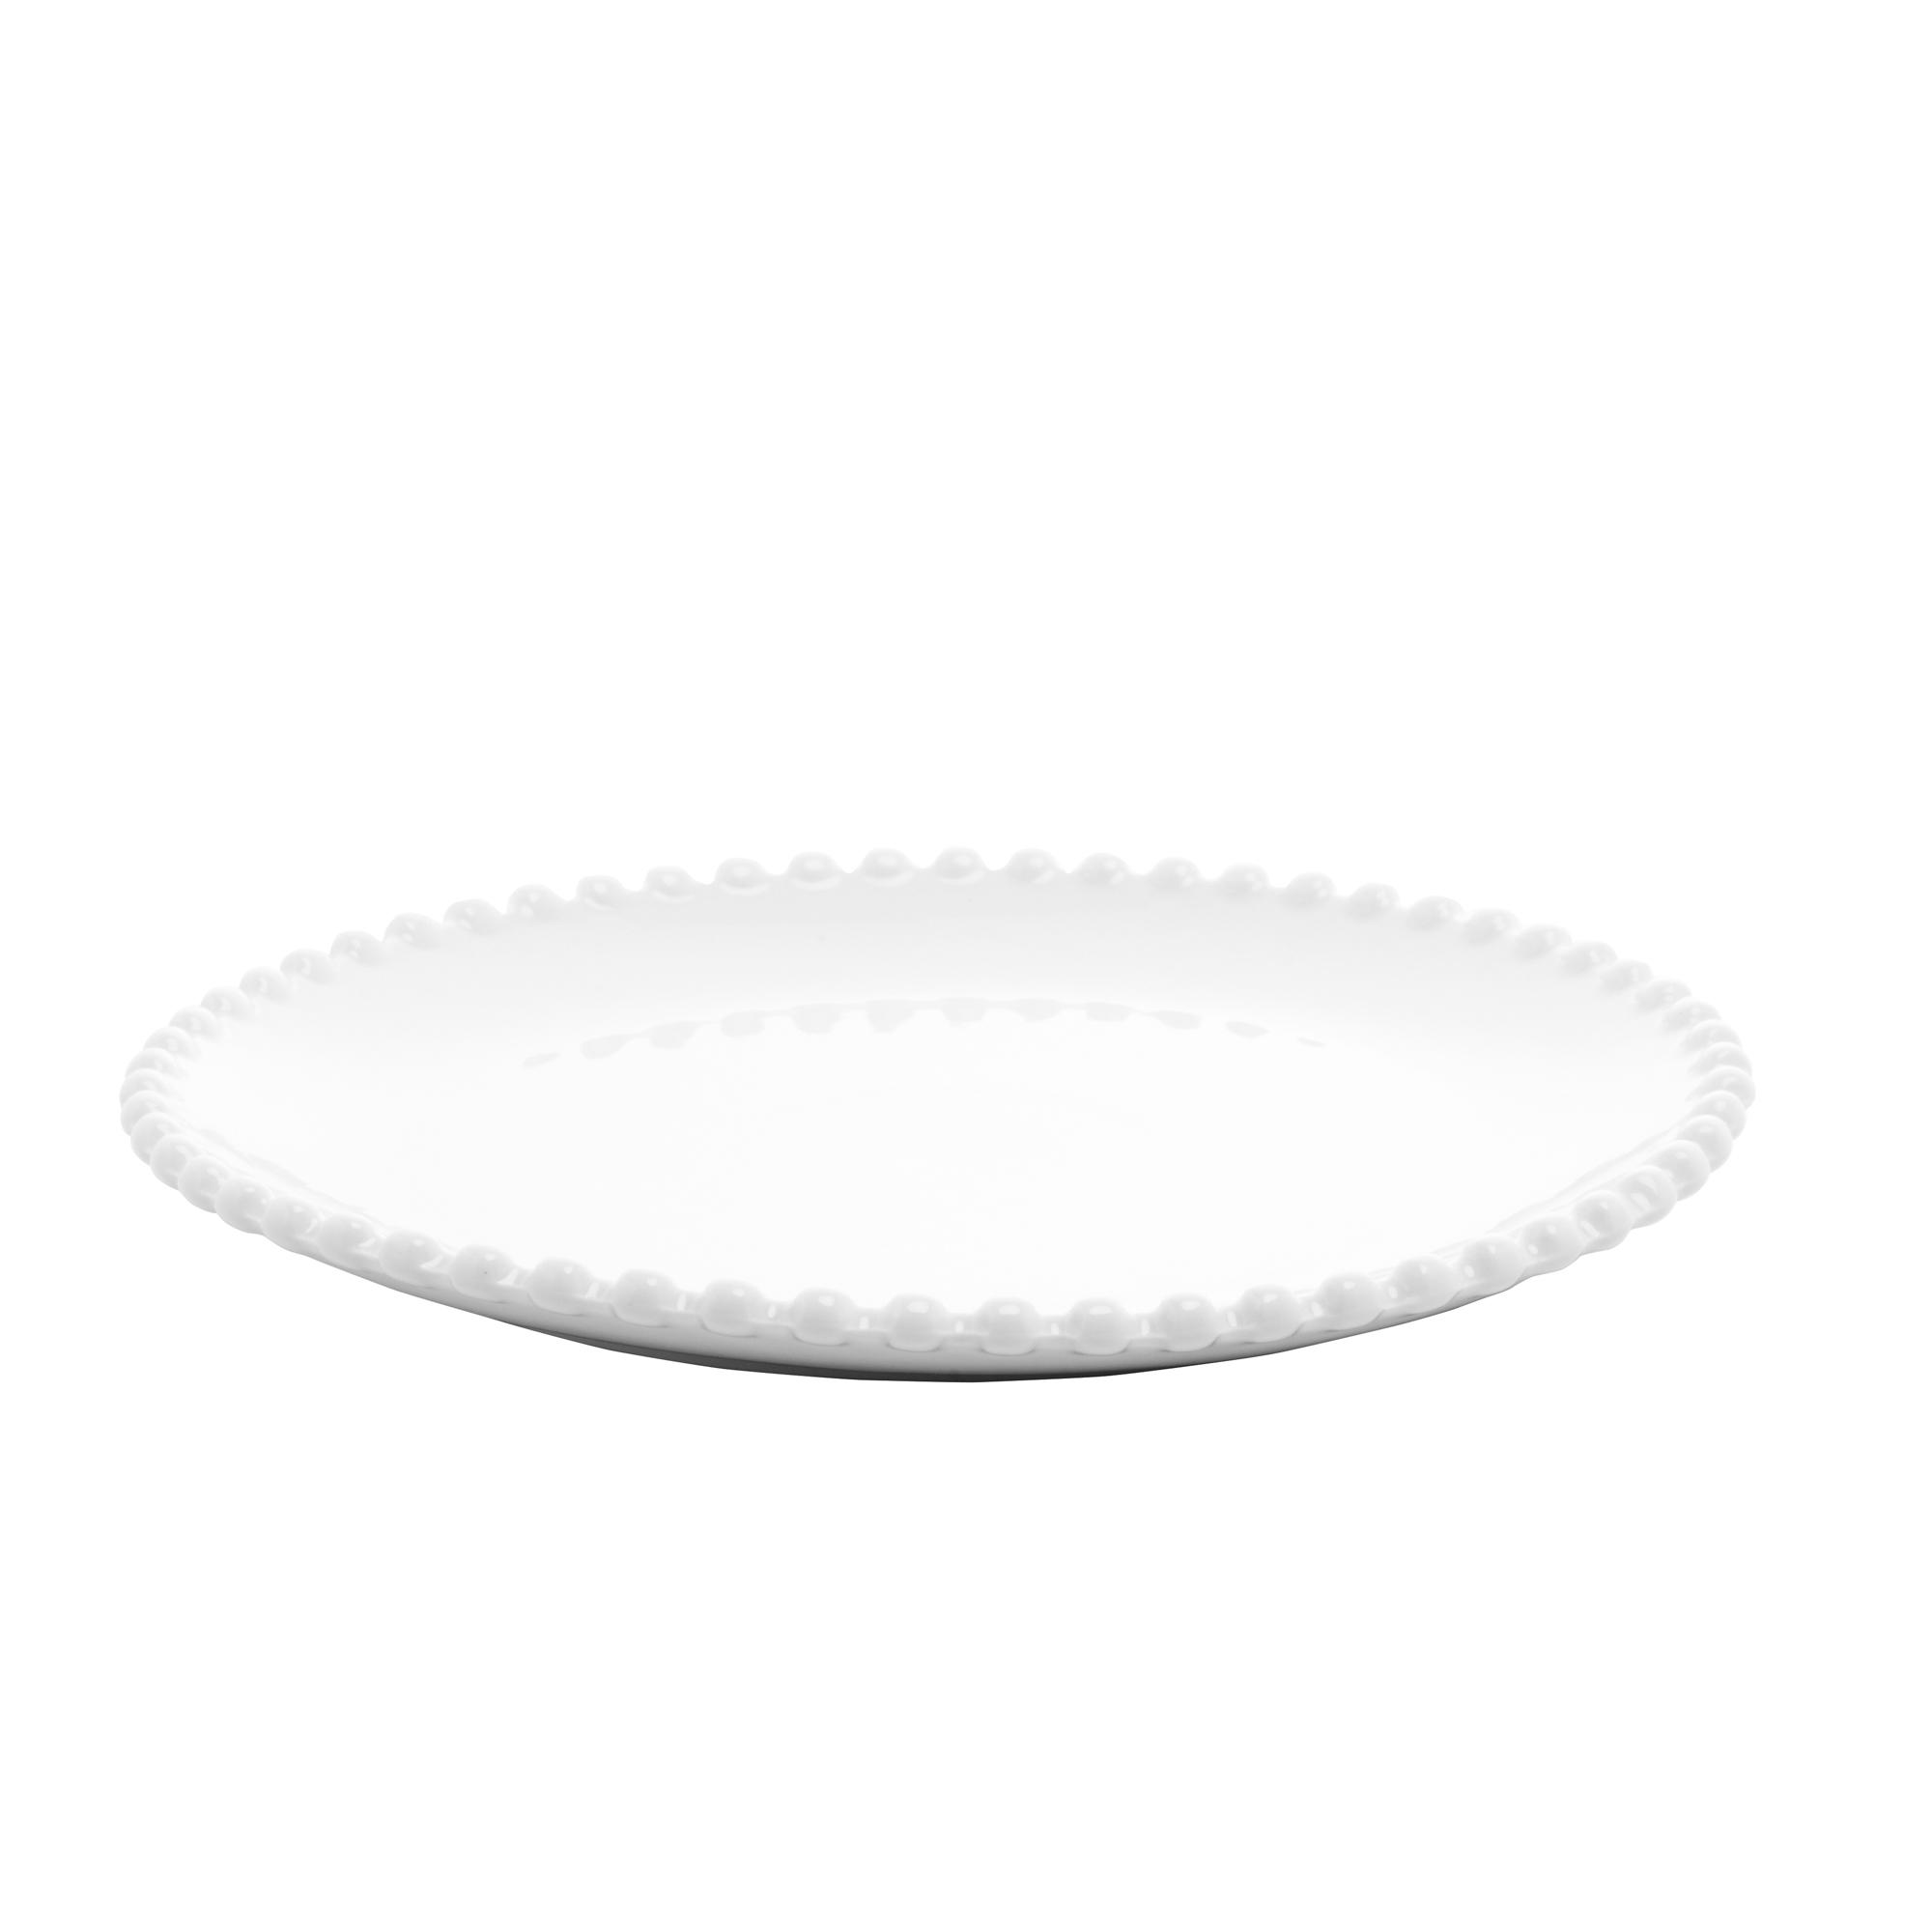 Cj 6 pratos porcelana sobremesa branca Beads 20cm Bon Gourmet